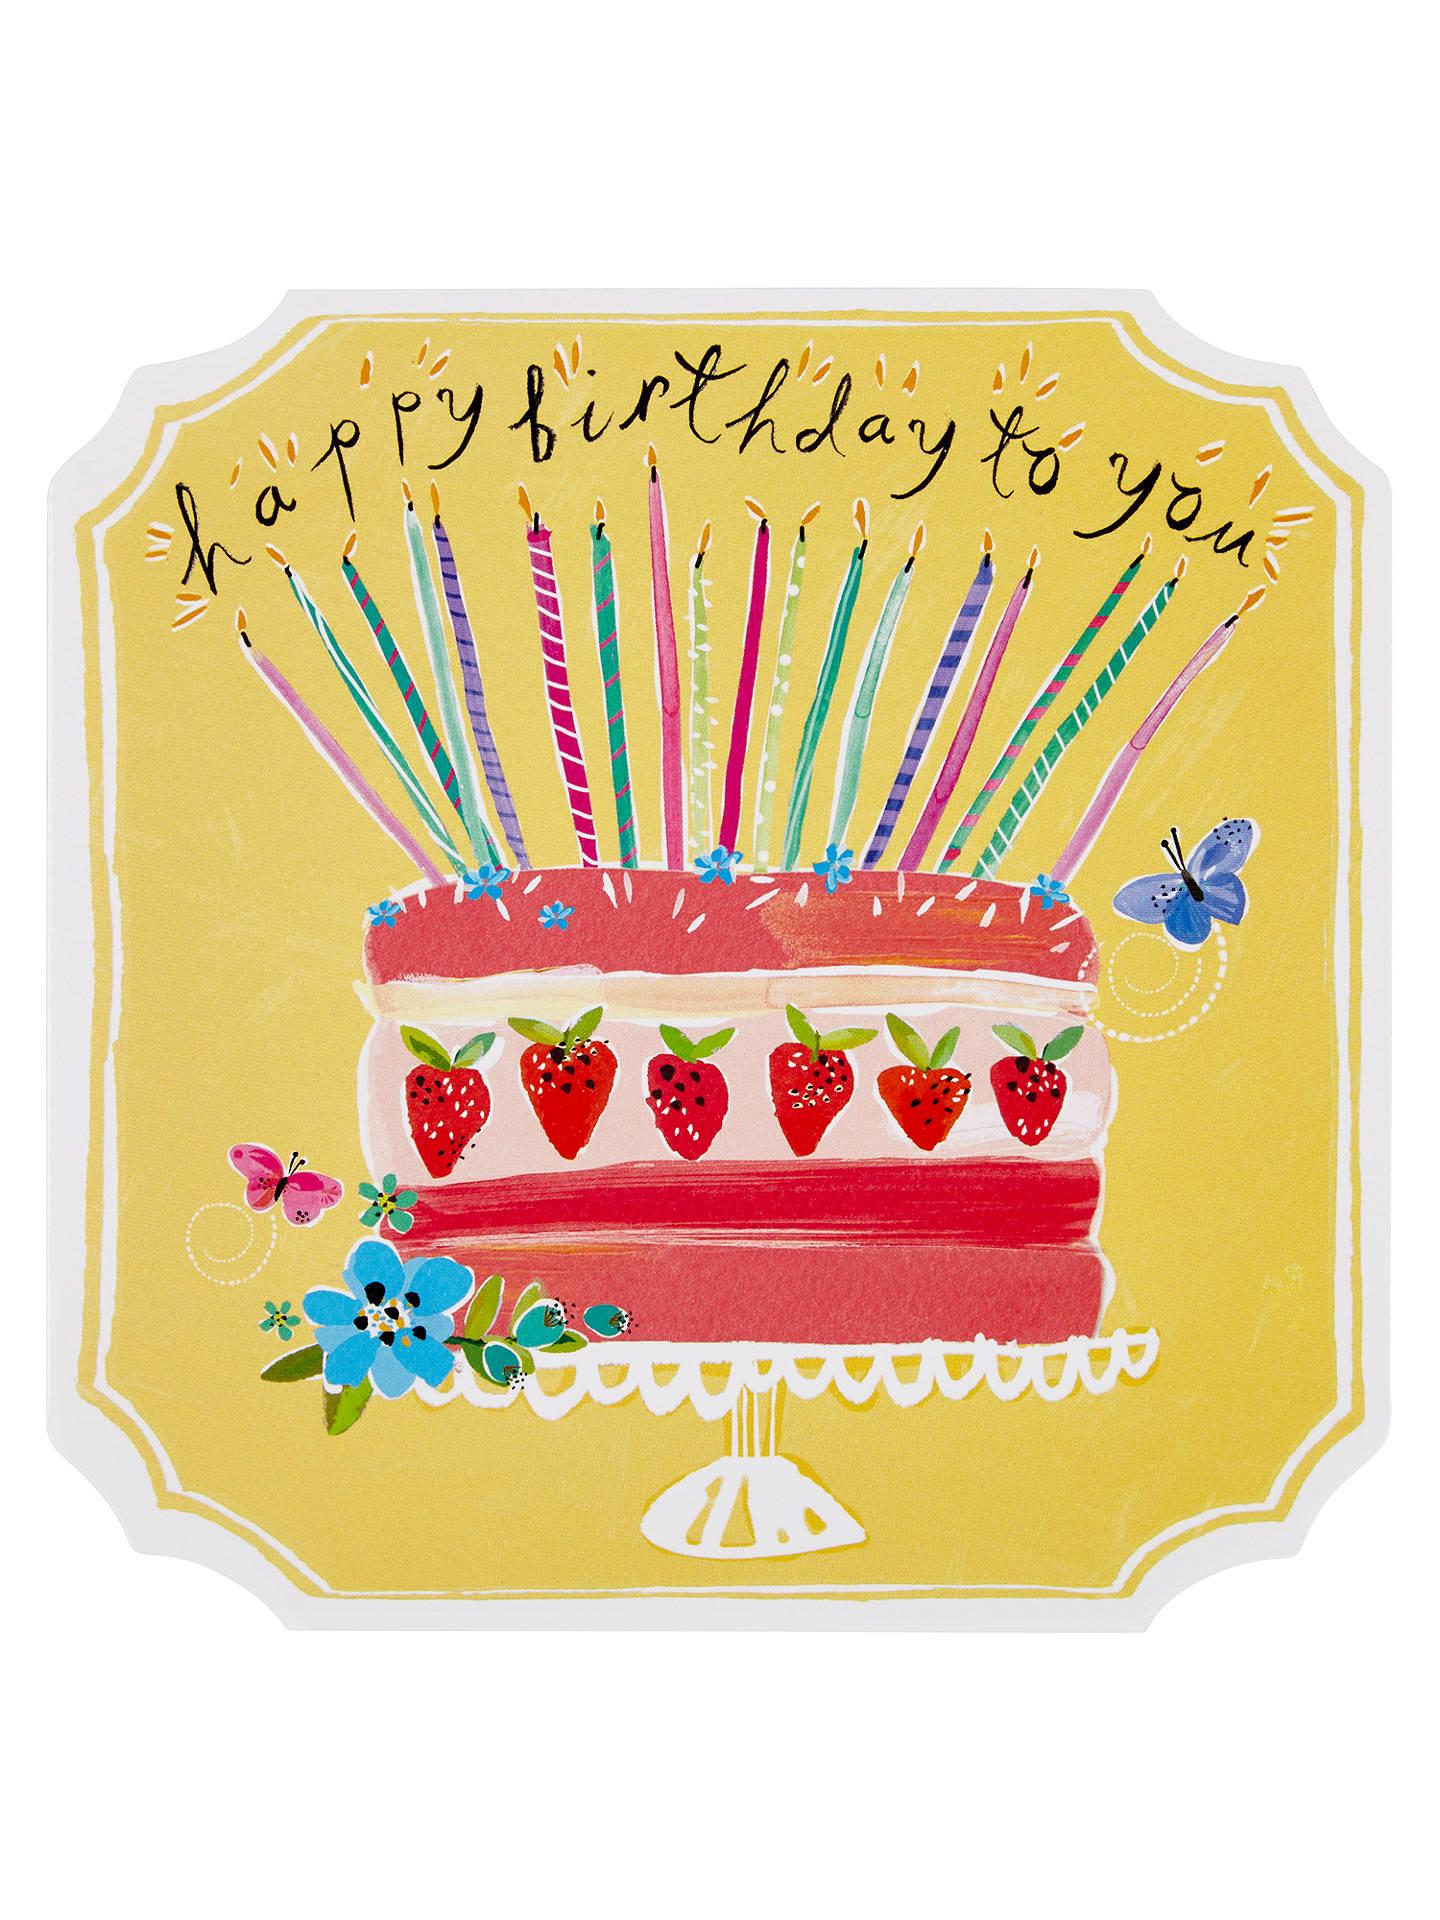 Brilliant Paperlink Birthday Cake Greetings Card At John Lewis Partners Funny Birthday Cards Online Elaedamsfinfo